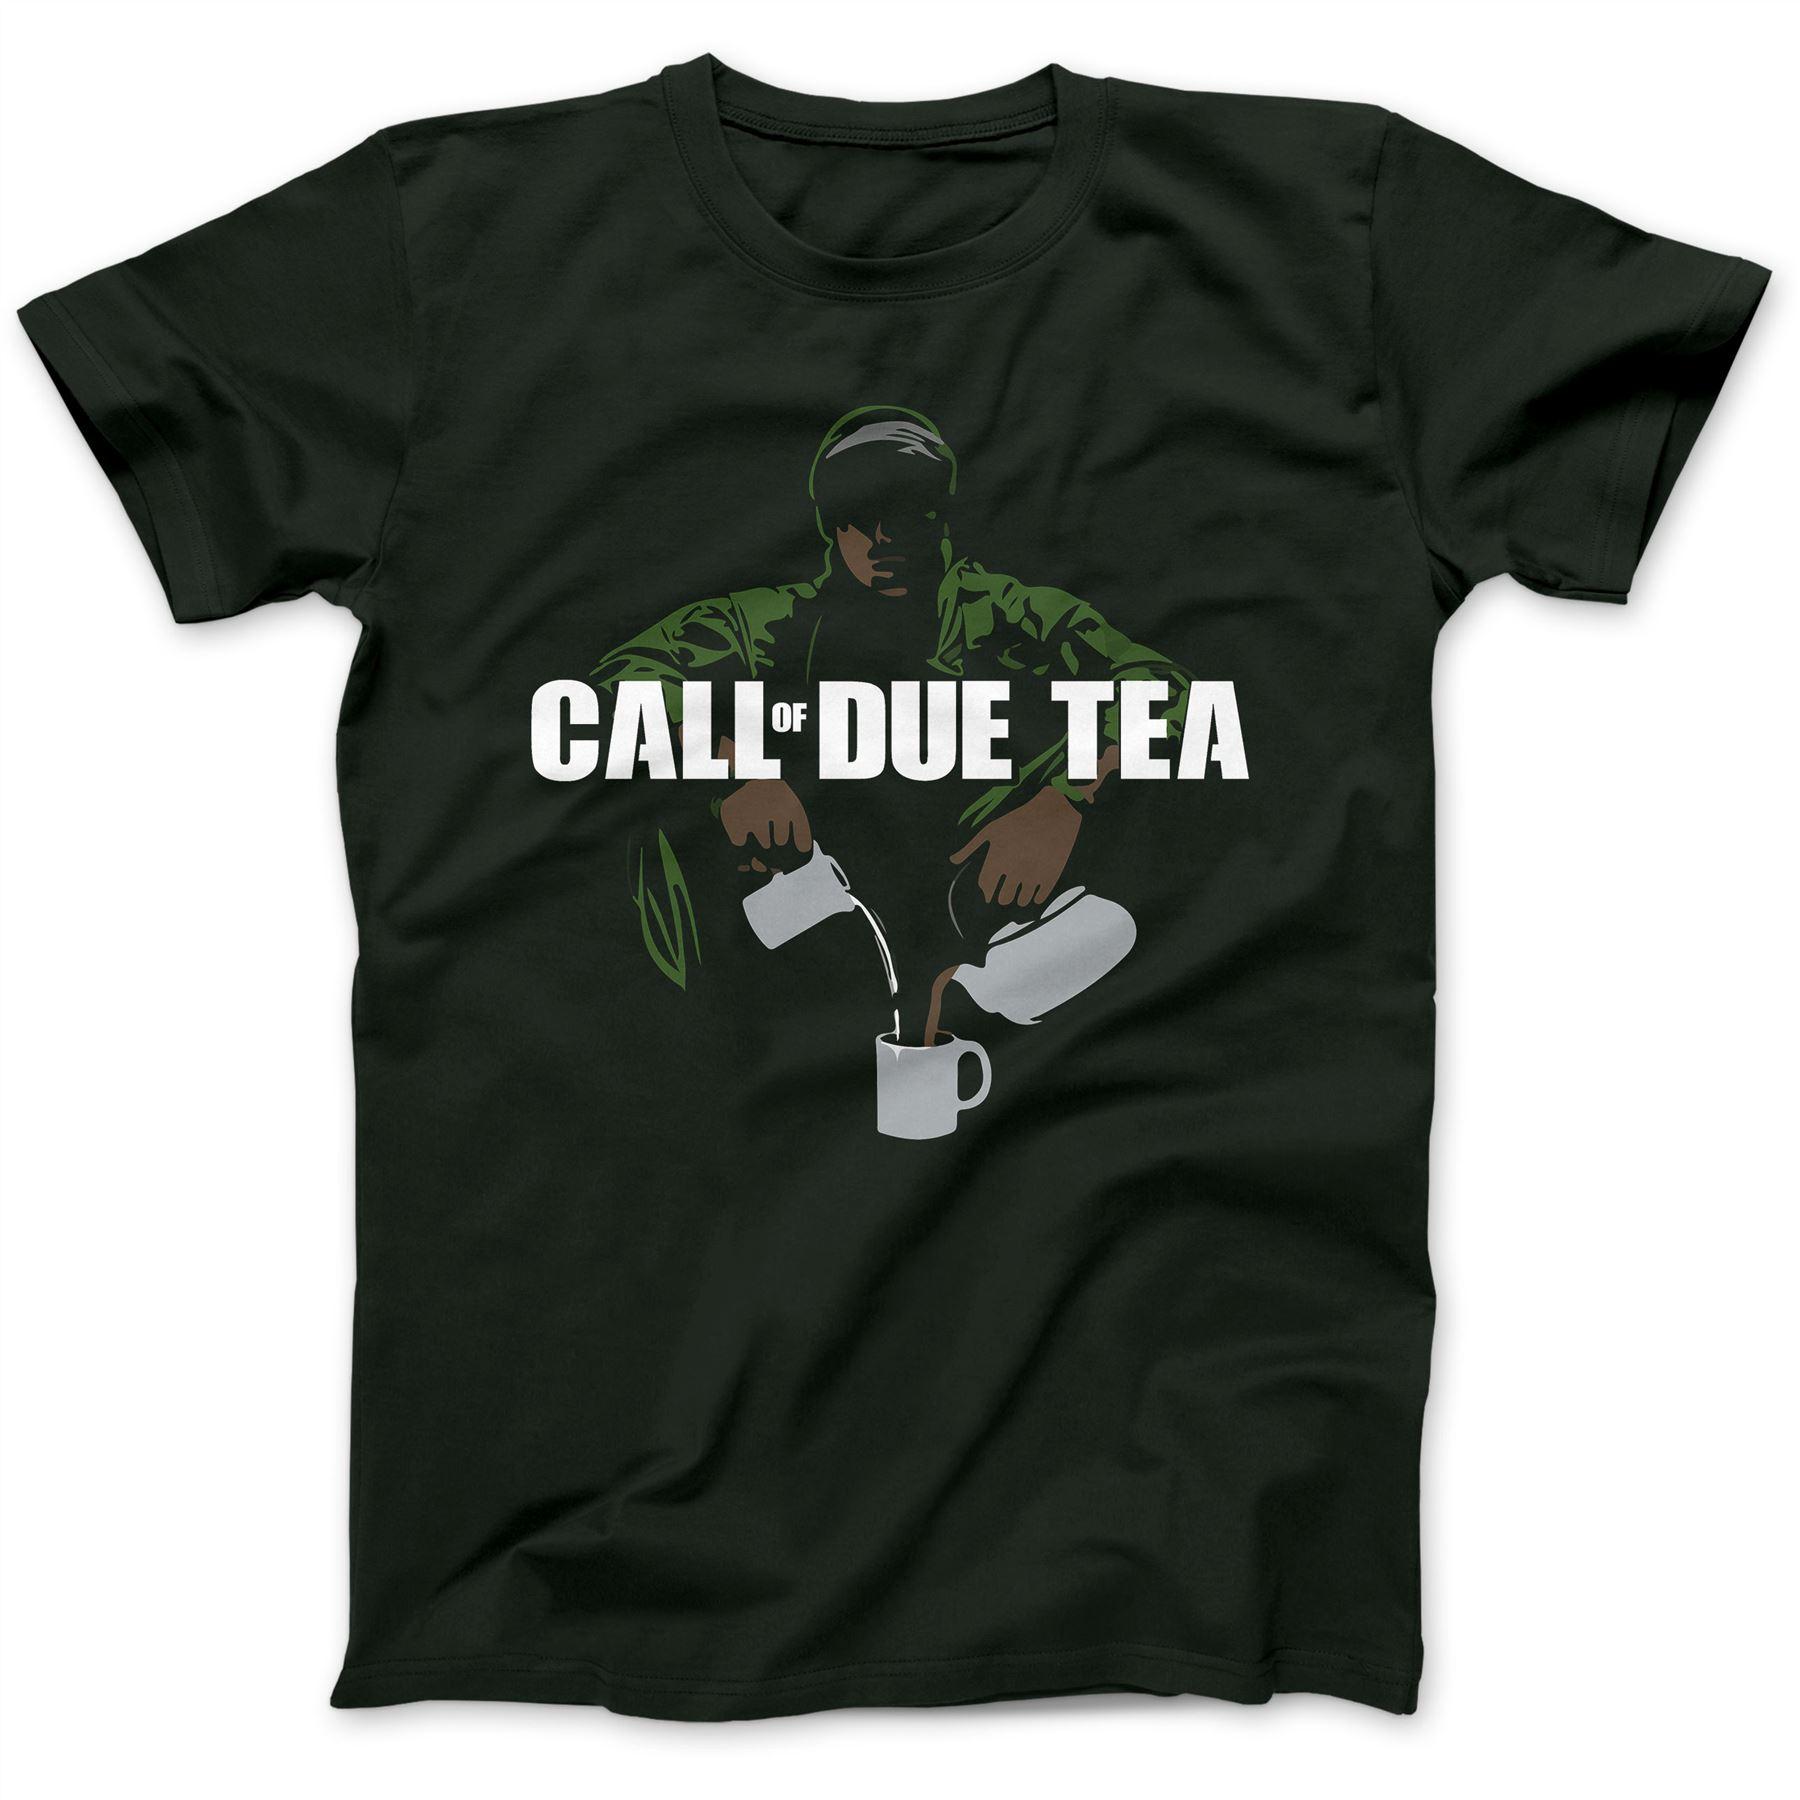 Call of Due Tea Parody T-Shirt 100% Premium Cotton Advanced Warfare Duty Short Sleeve Round Neck T Shirt Promotion